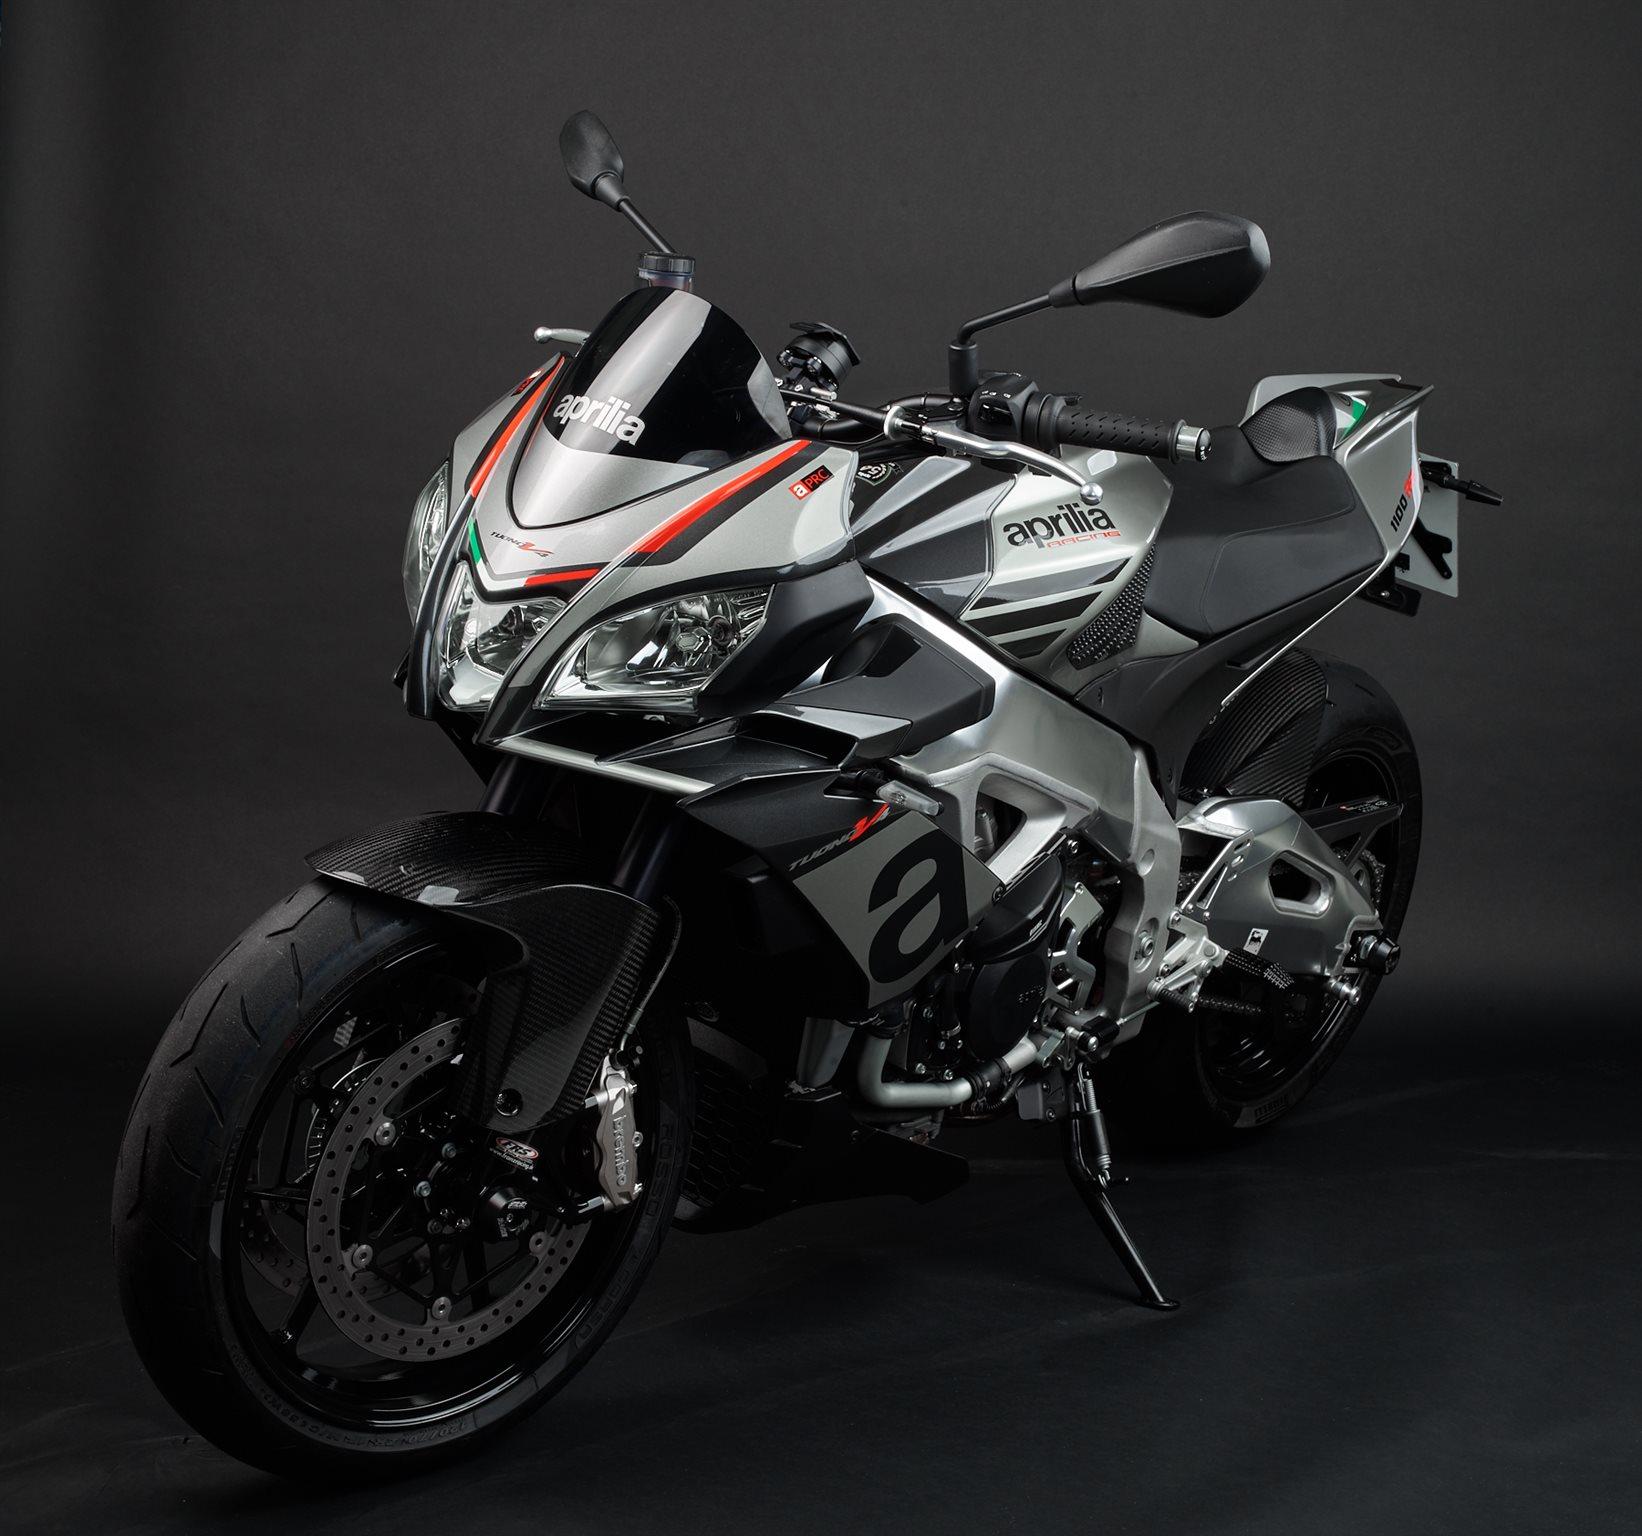 Umgebautes Motorrad Aprilia Tuono V4 1100 RR Von